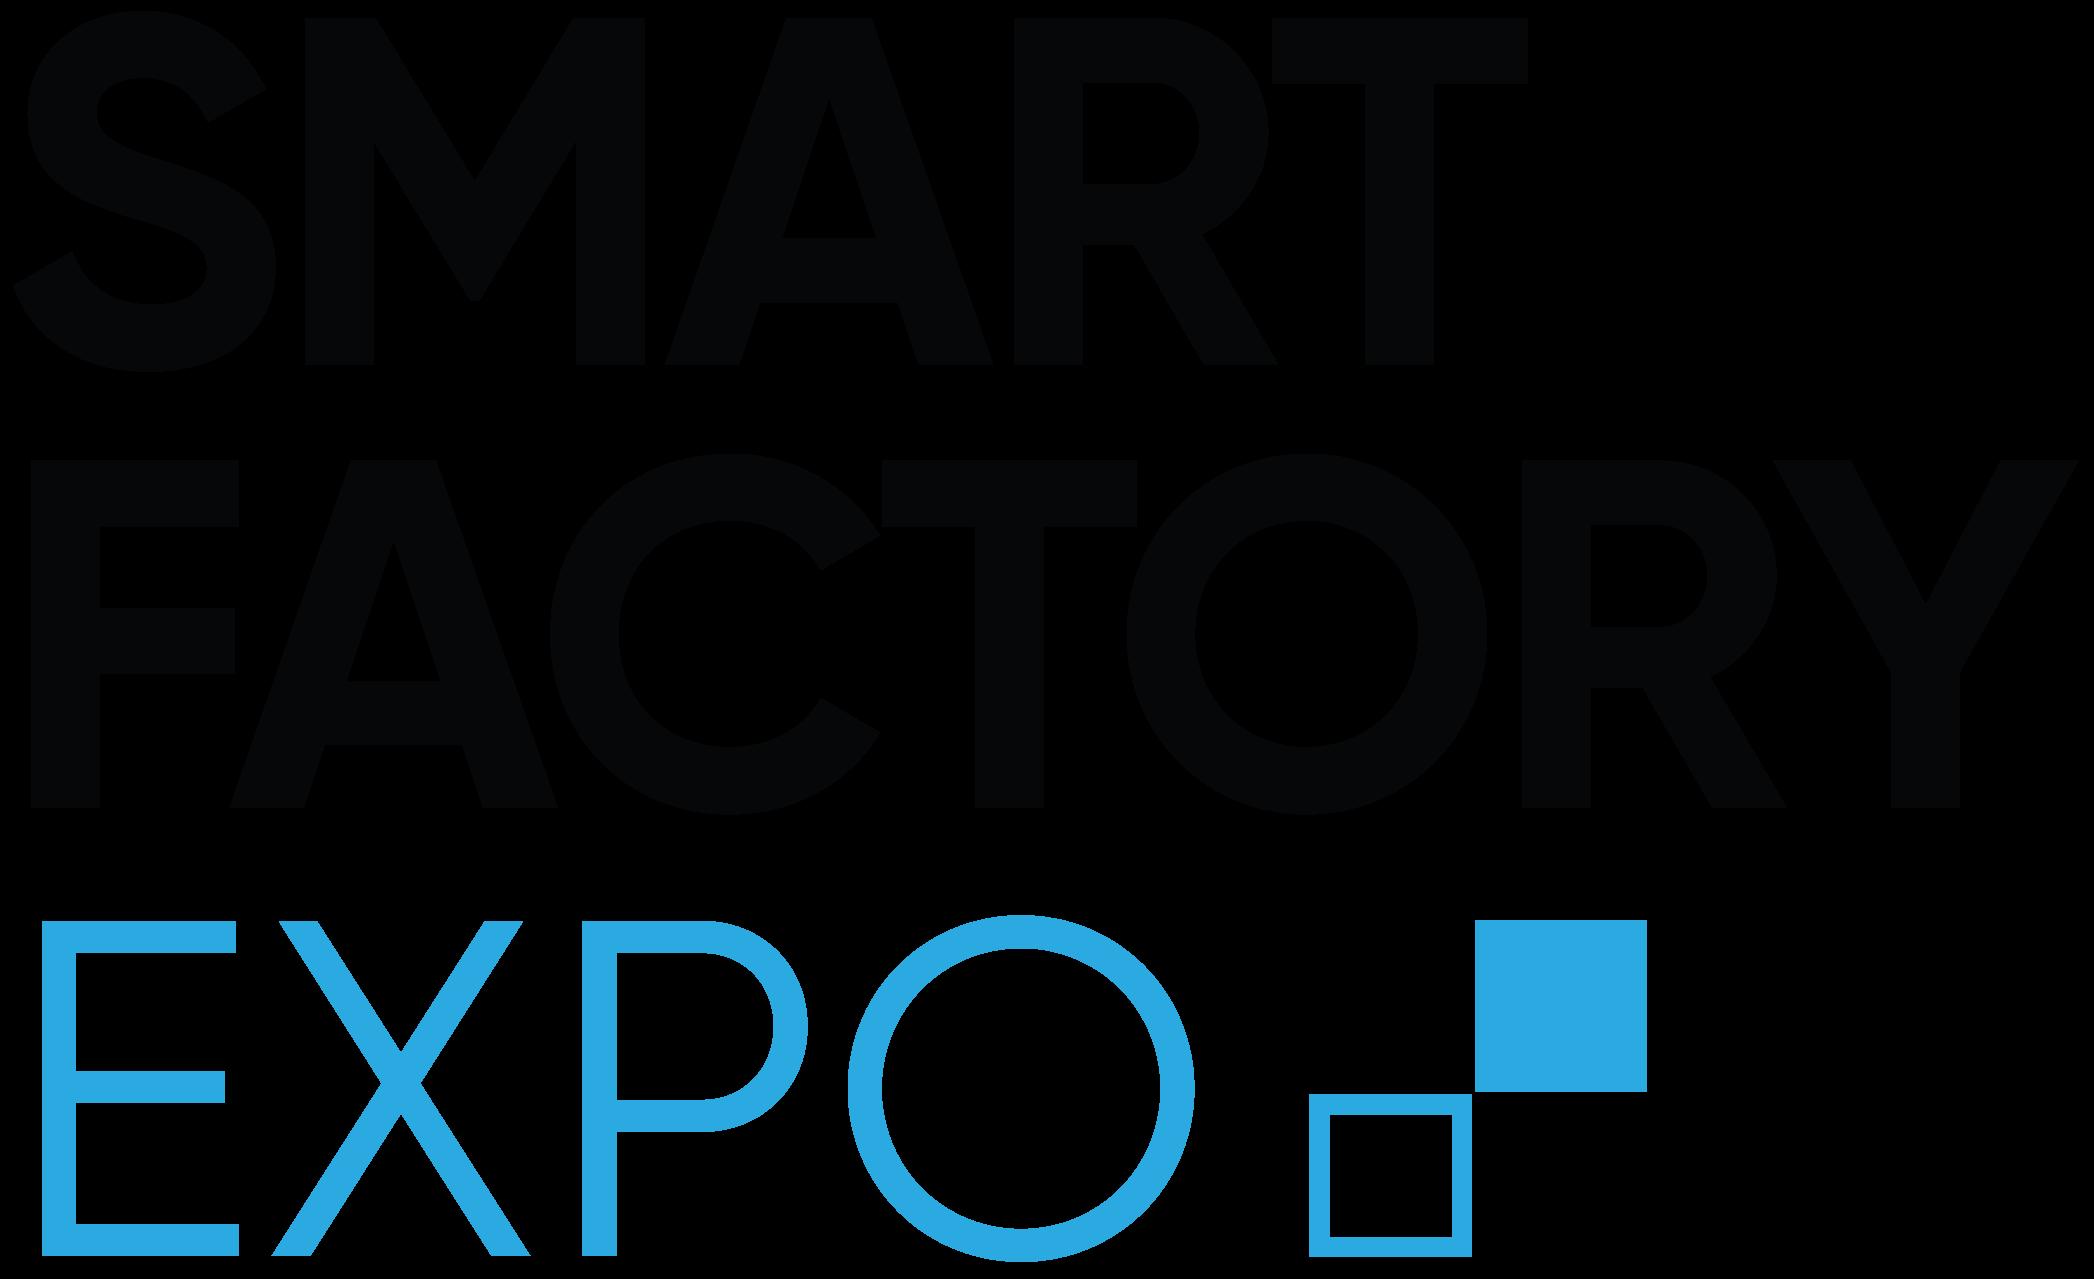 Smart Factor Expo